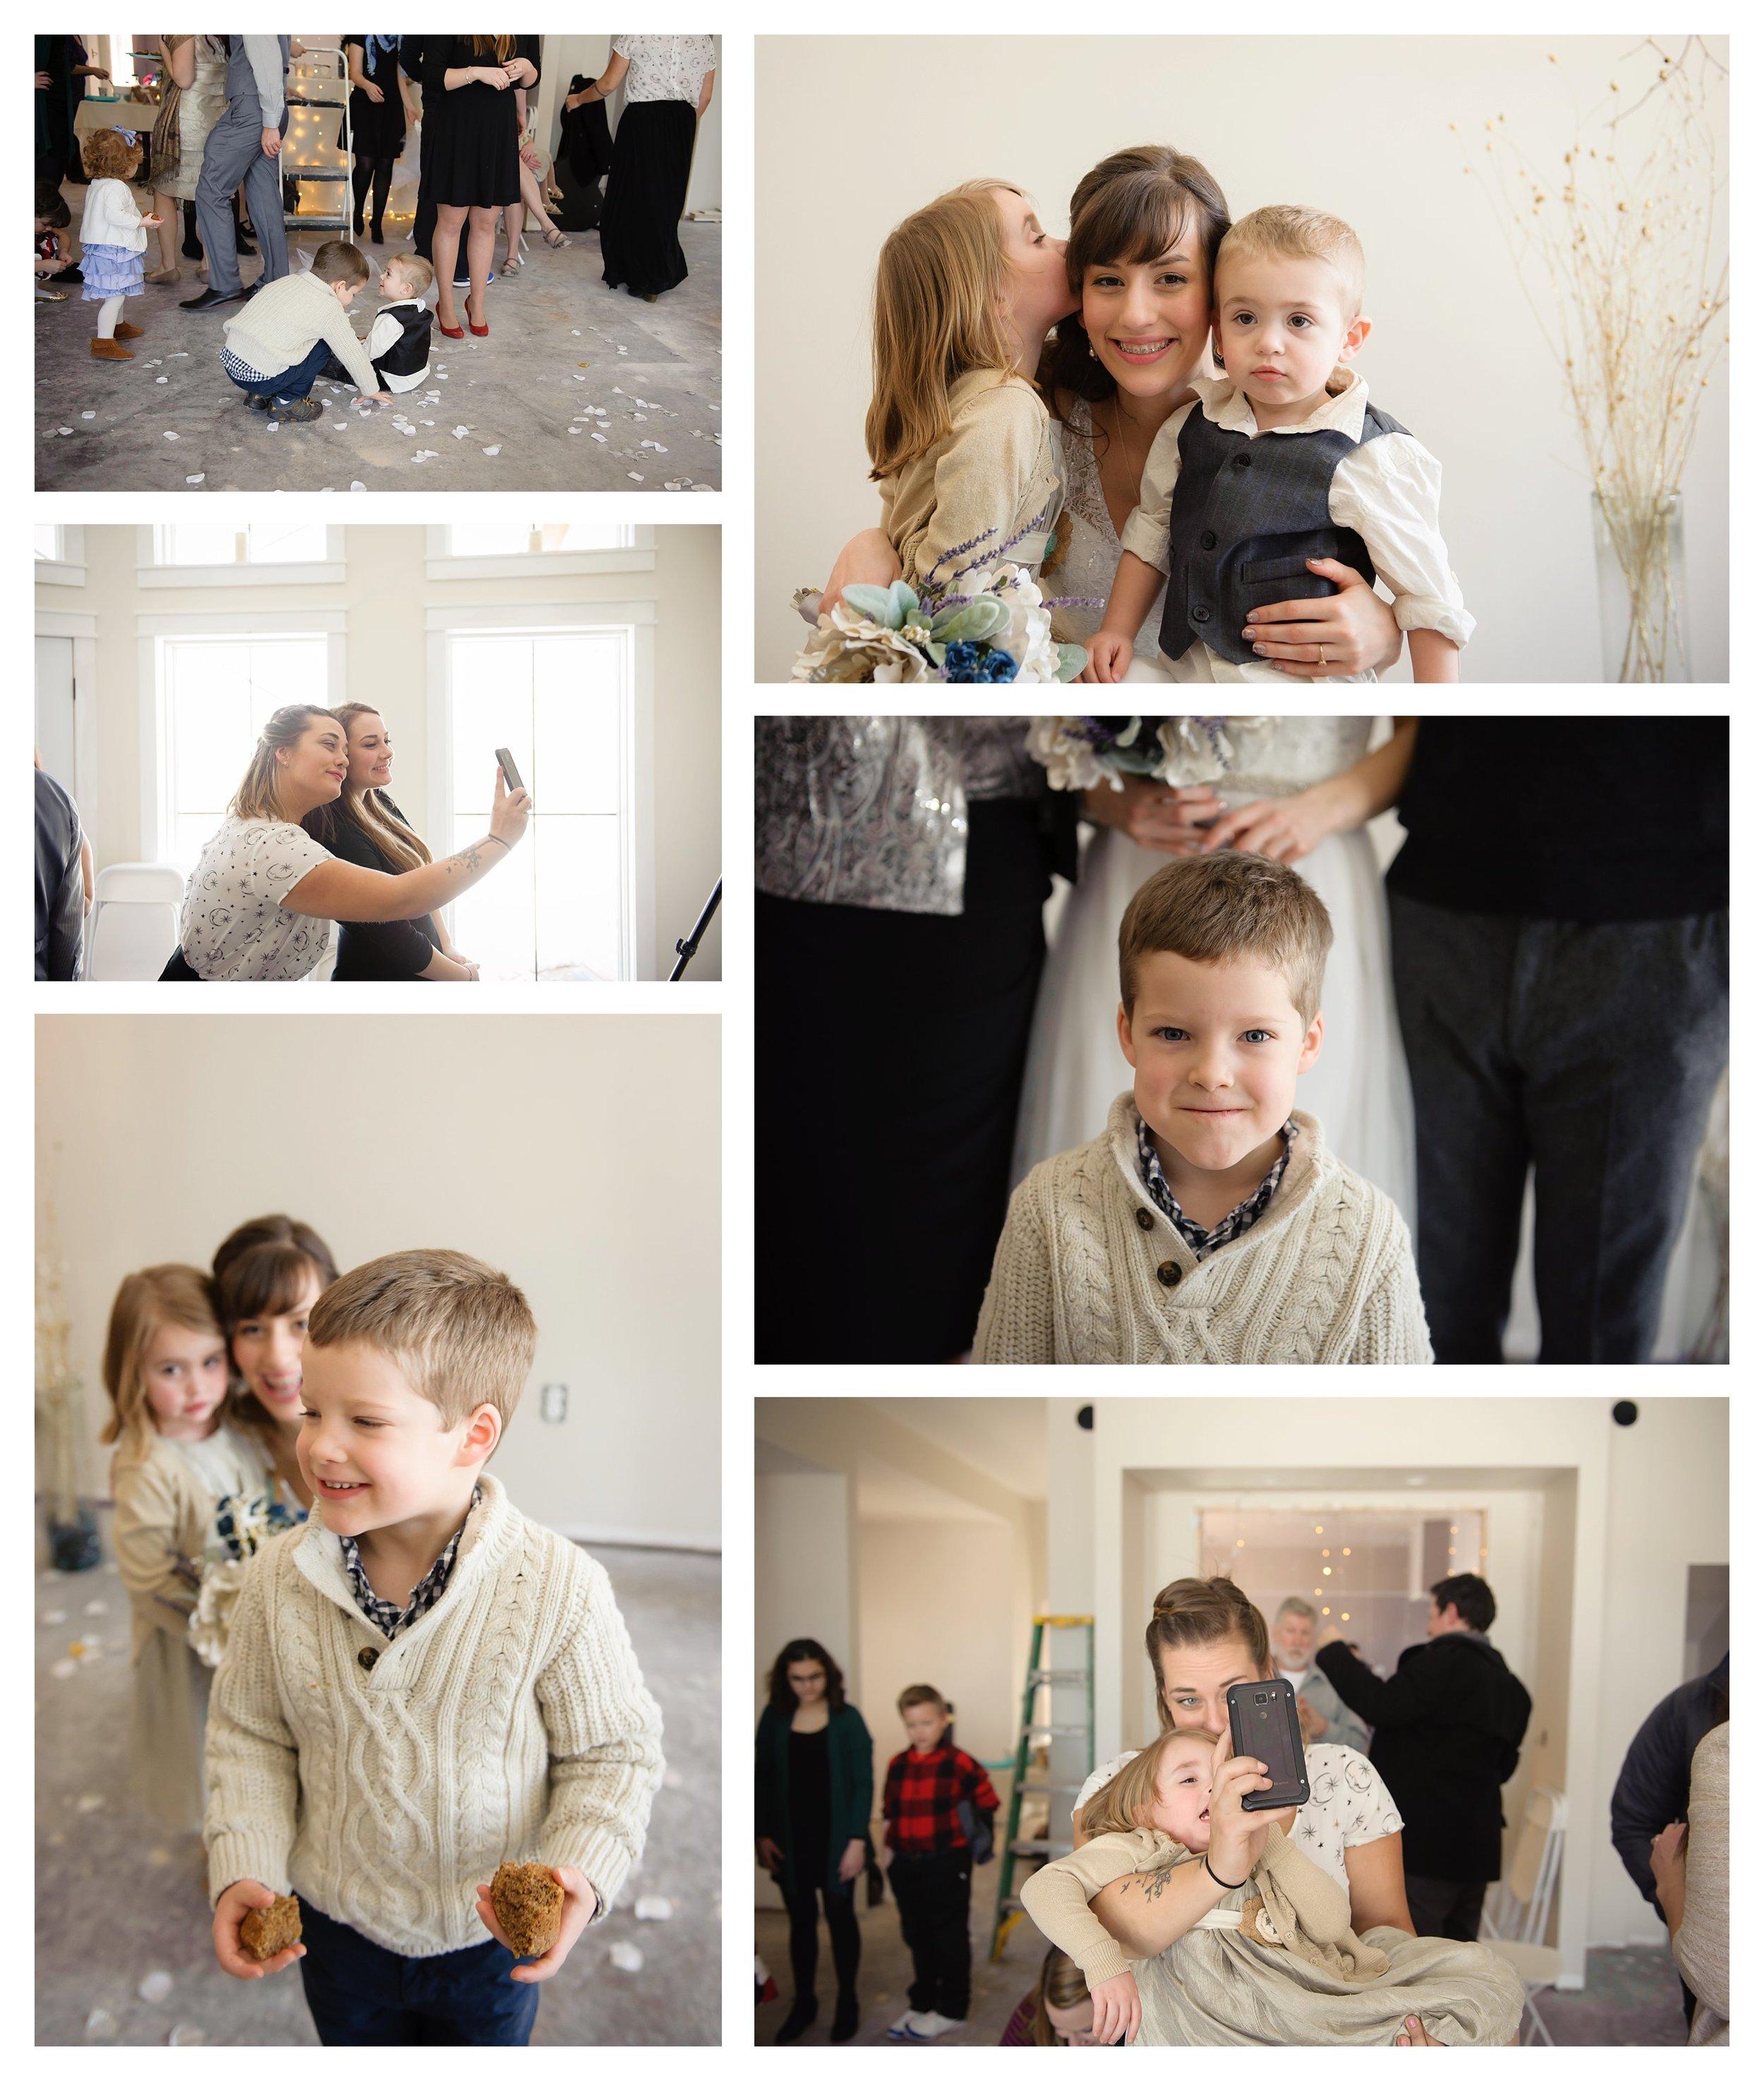 wisconsin wedding photographer timber baron inn bayfield wi ps 139 photography jen jensen_0212.jpg